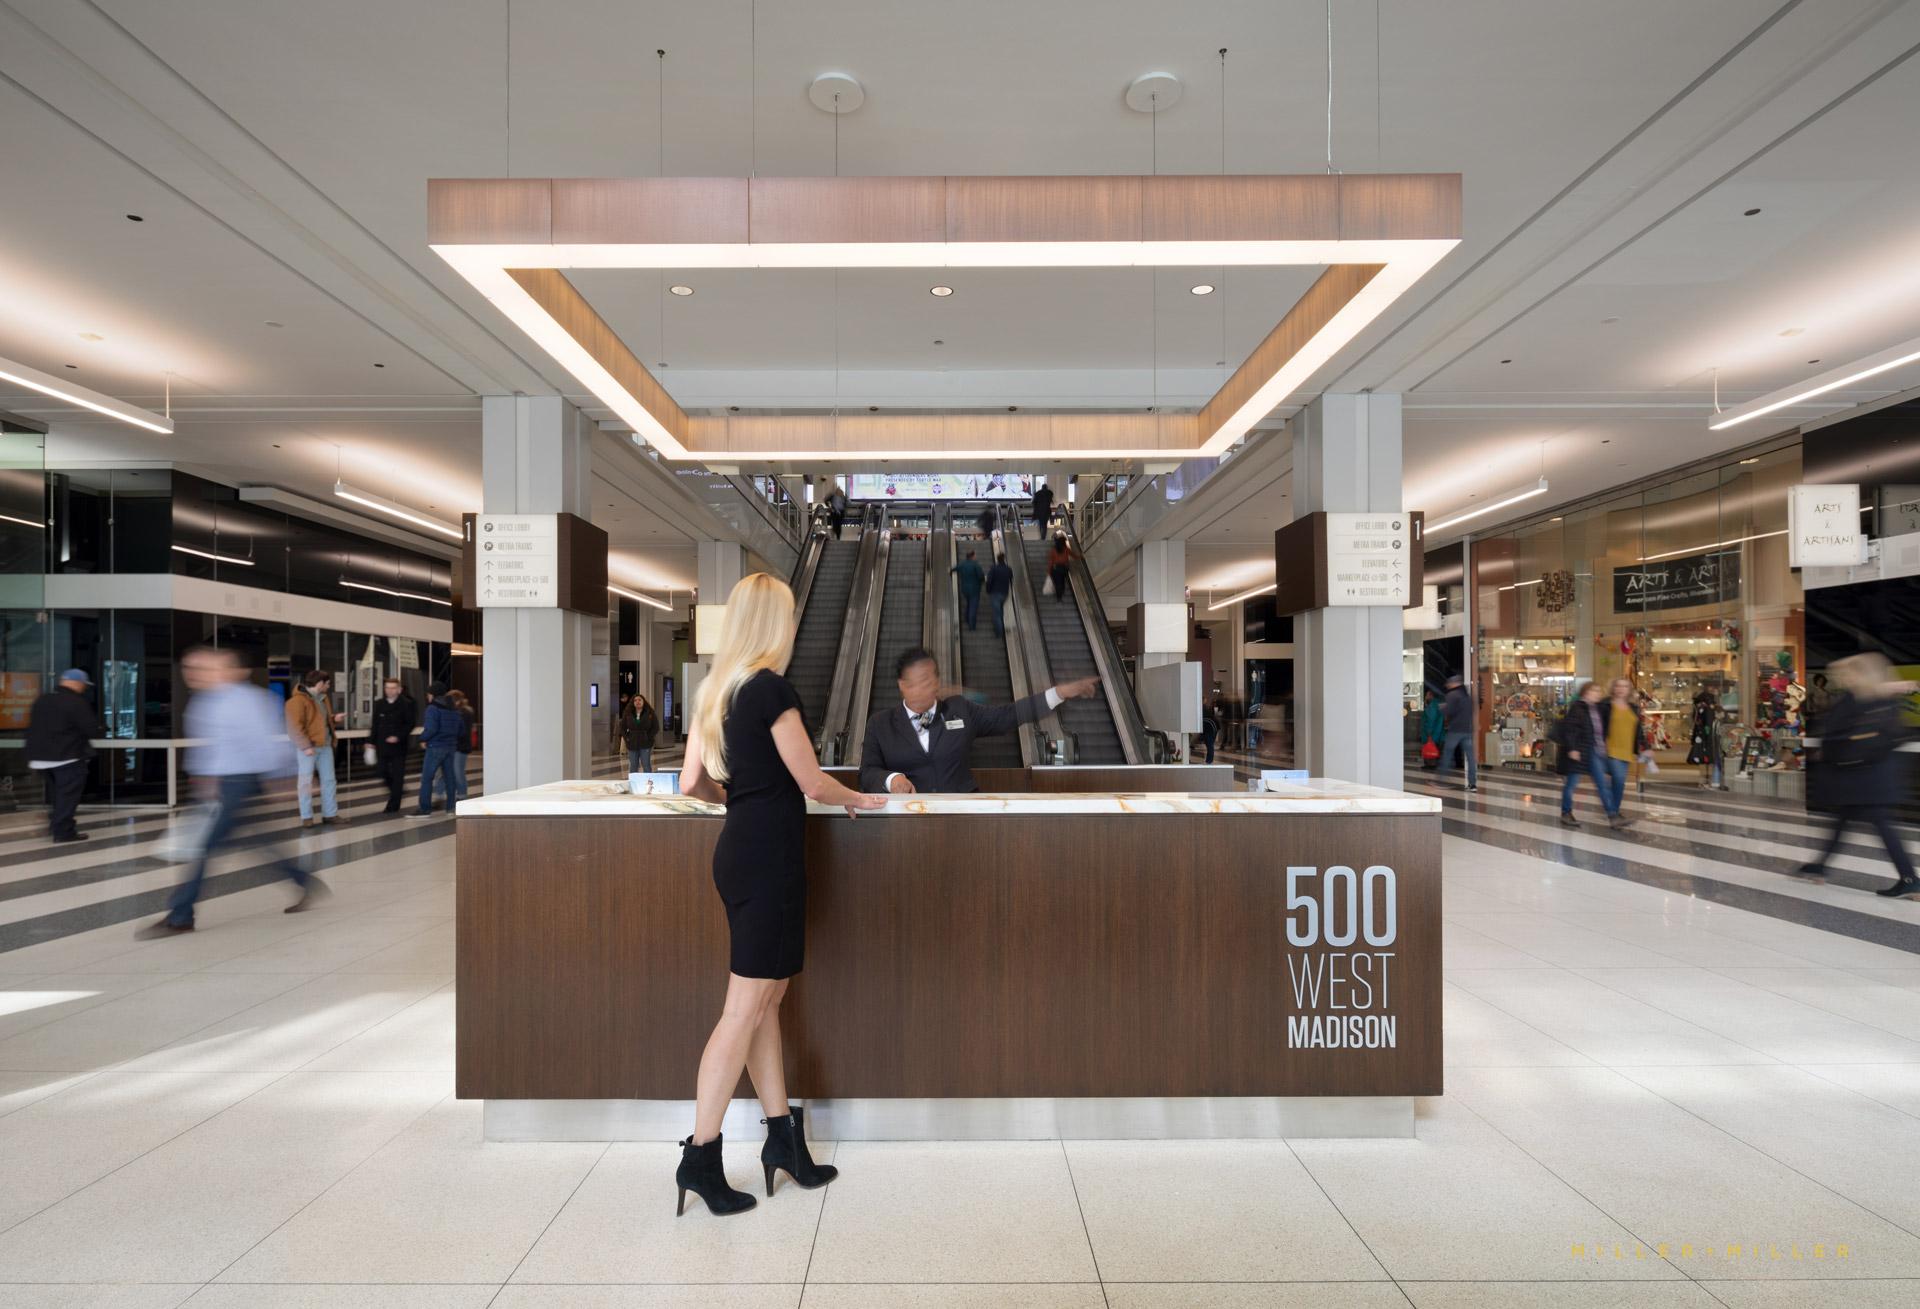 500 West Madison Entrance Interior